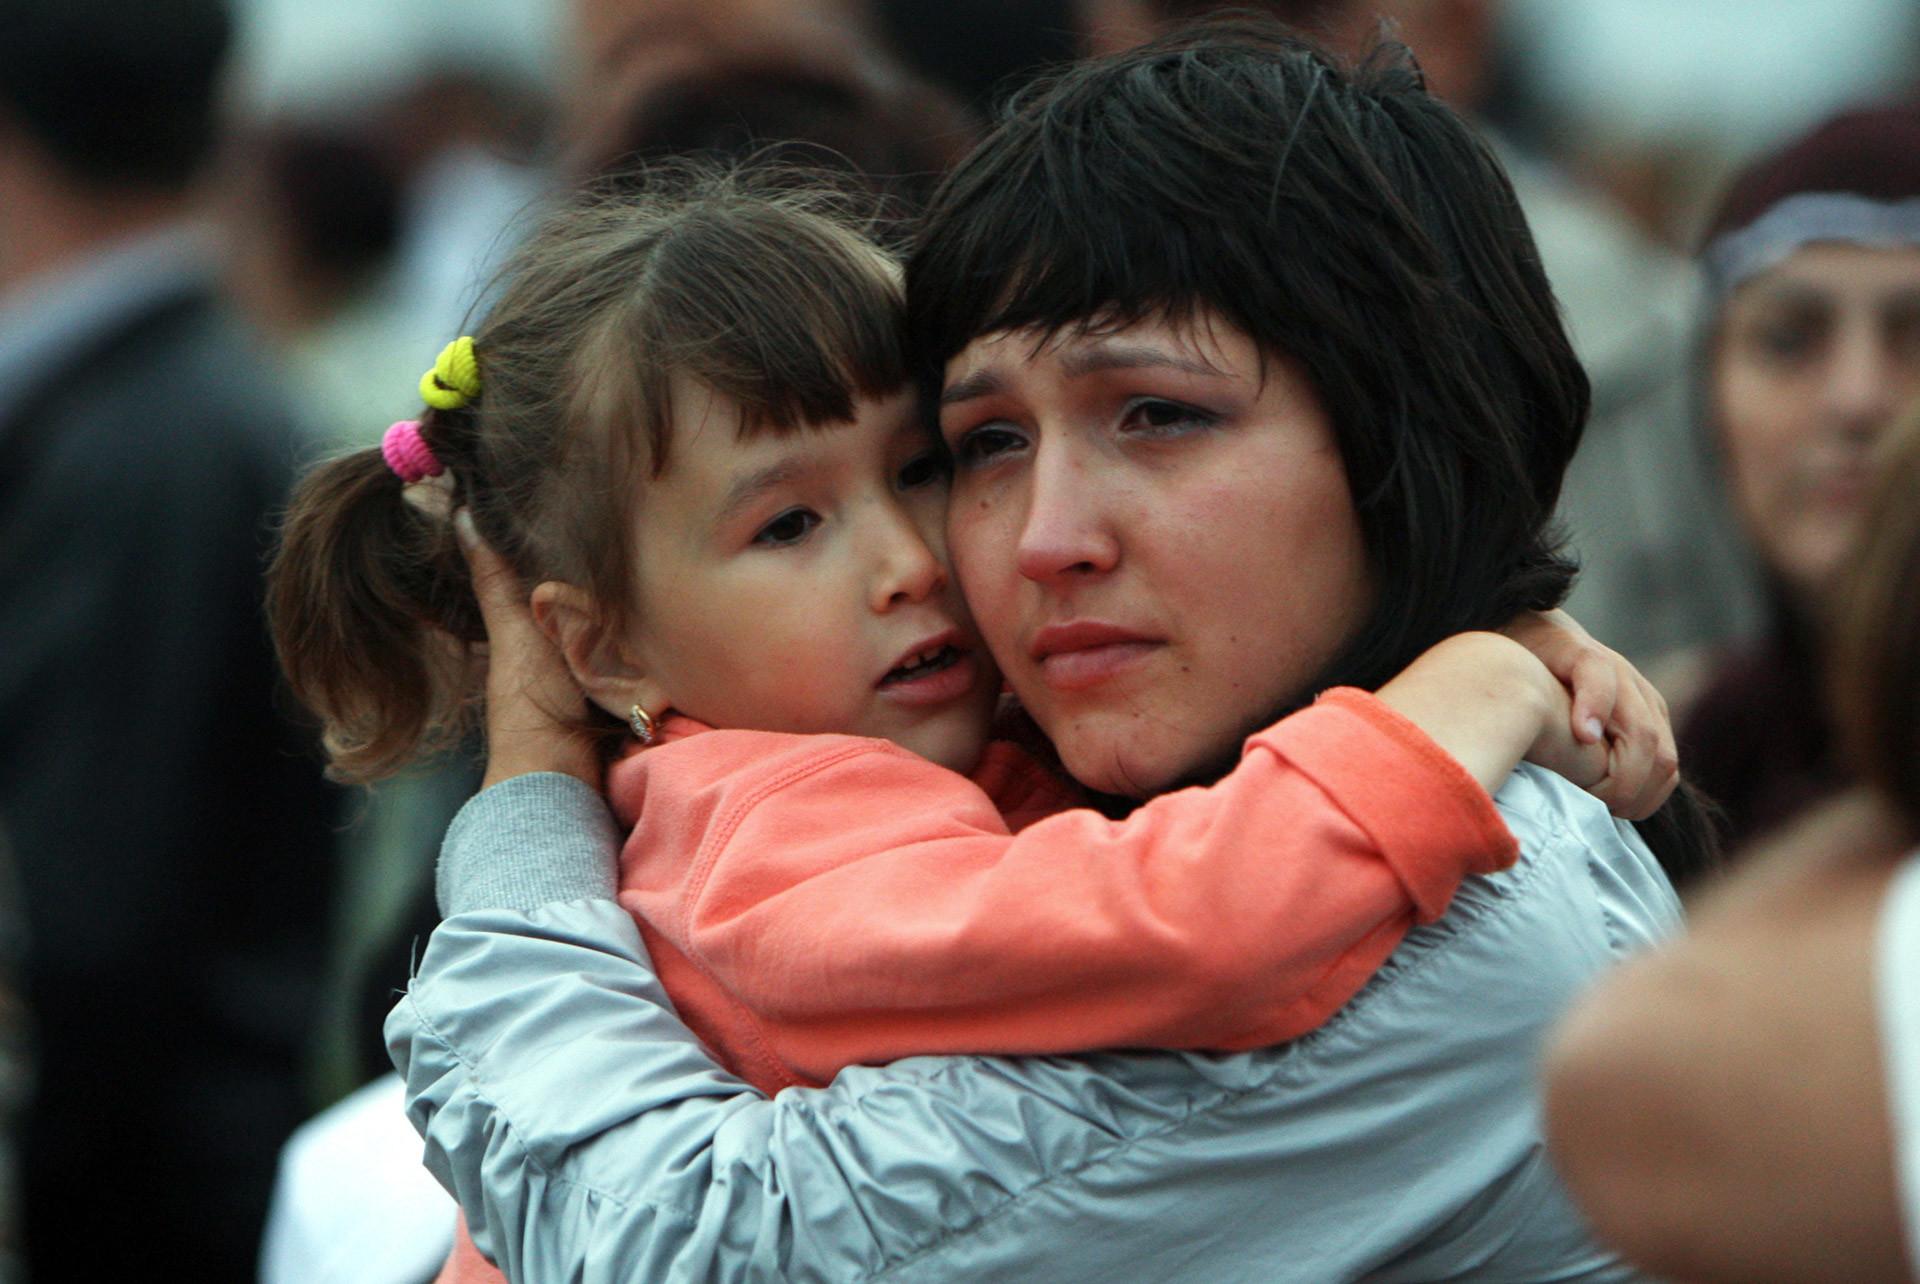 Фото © РИА Новости/Роман Кручинин